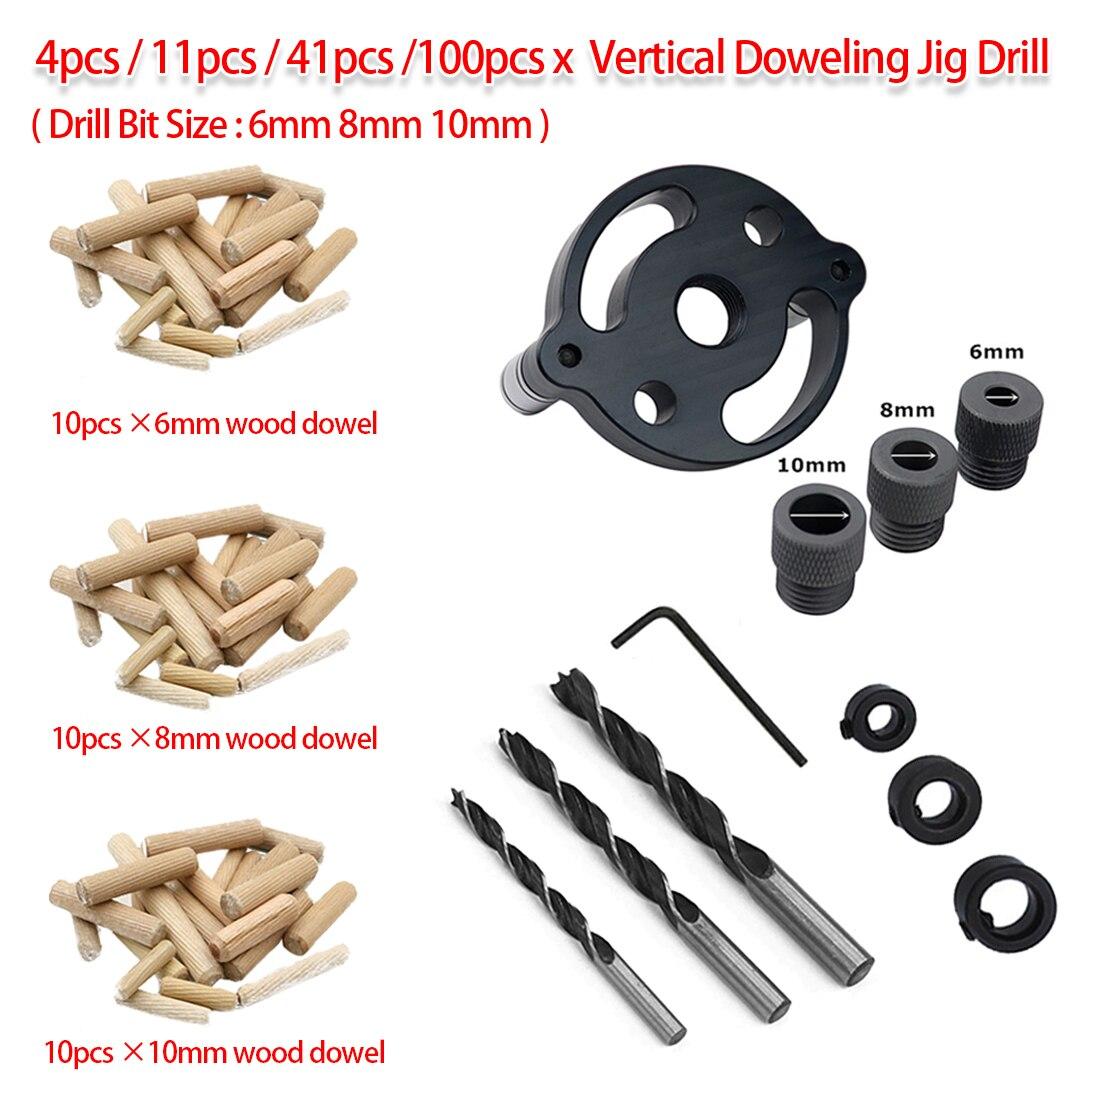 6mm 8mm 10mm Wood Dowelling 4pcs/11pcs/41pcs/100pcs Pocket Hole Jig Self Centering Drill Guide Kit Hole Puncher Locator Tool